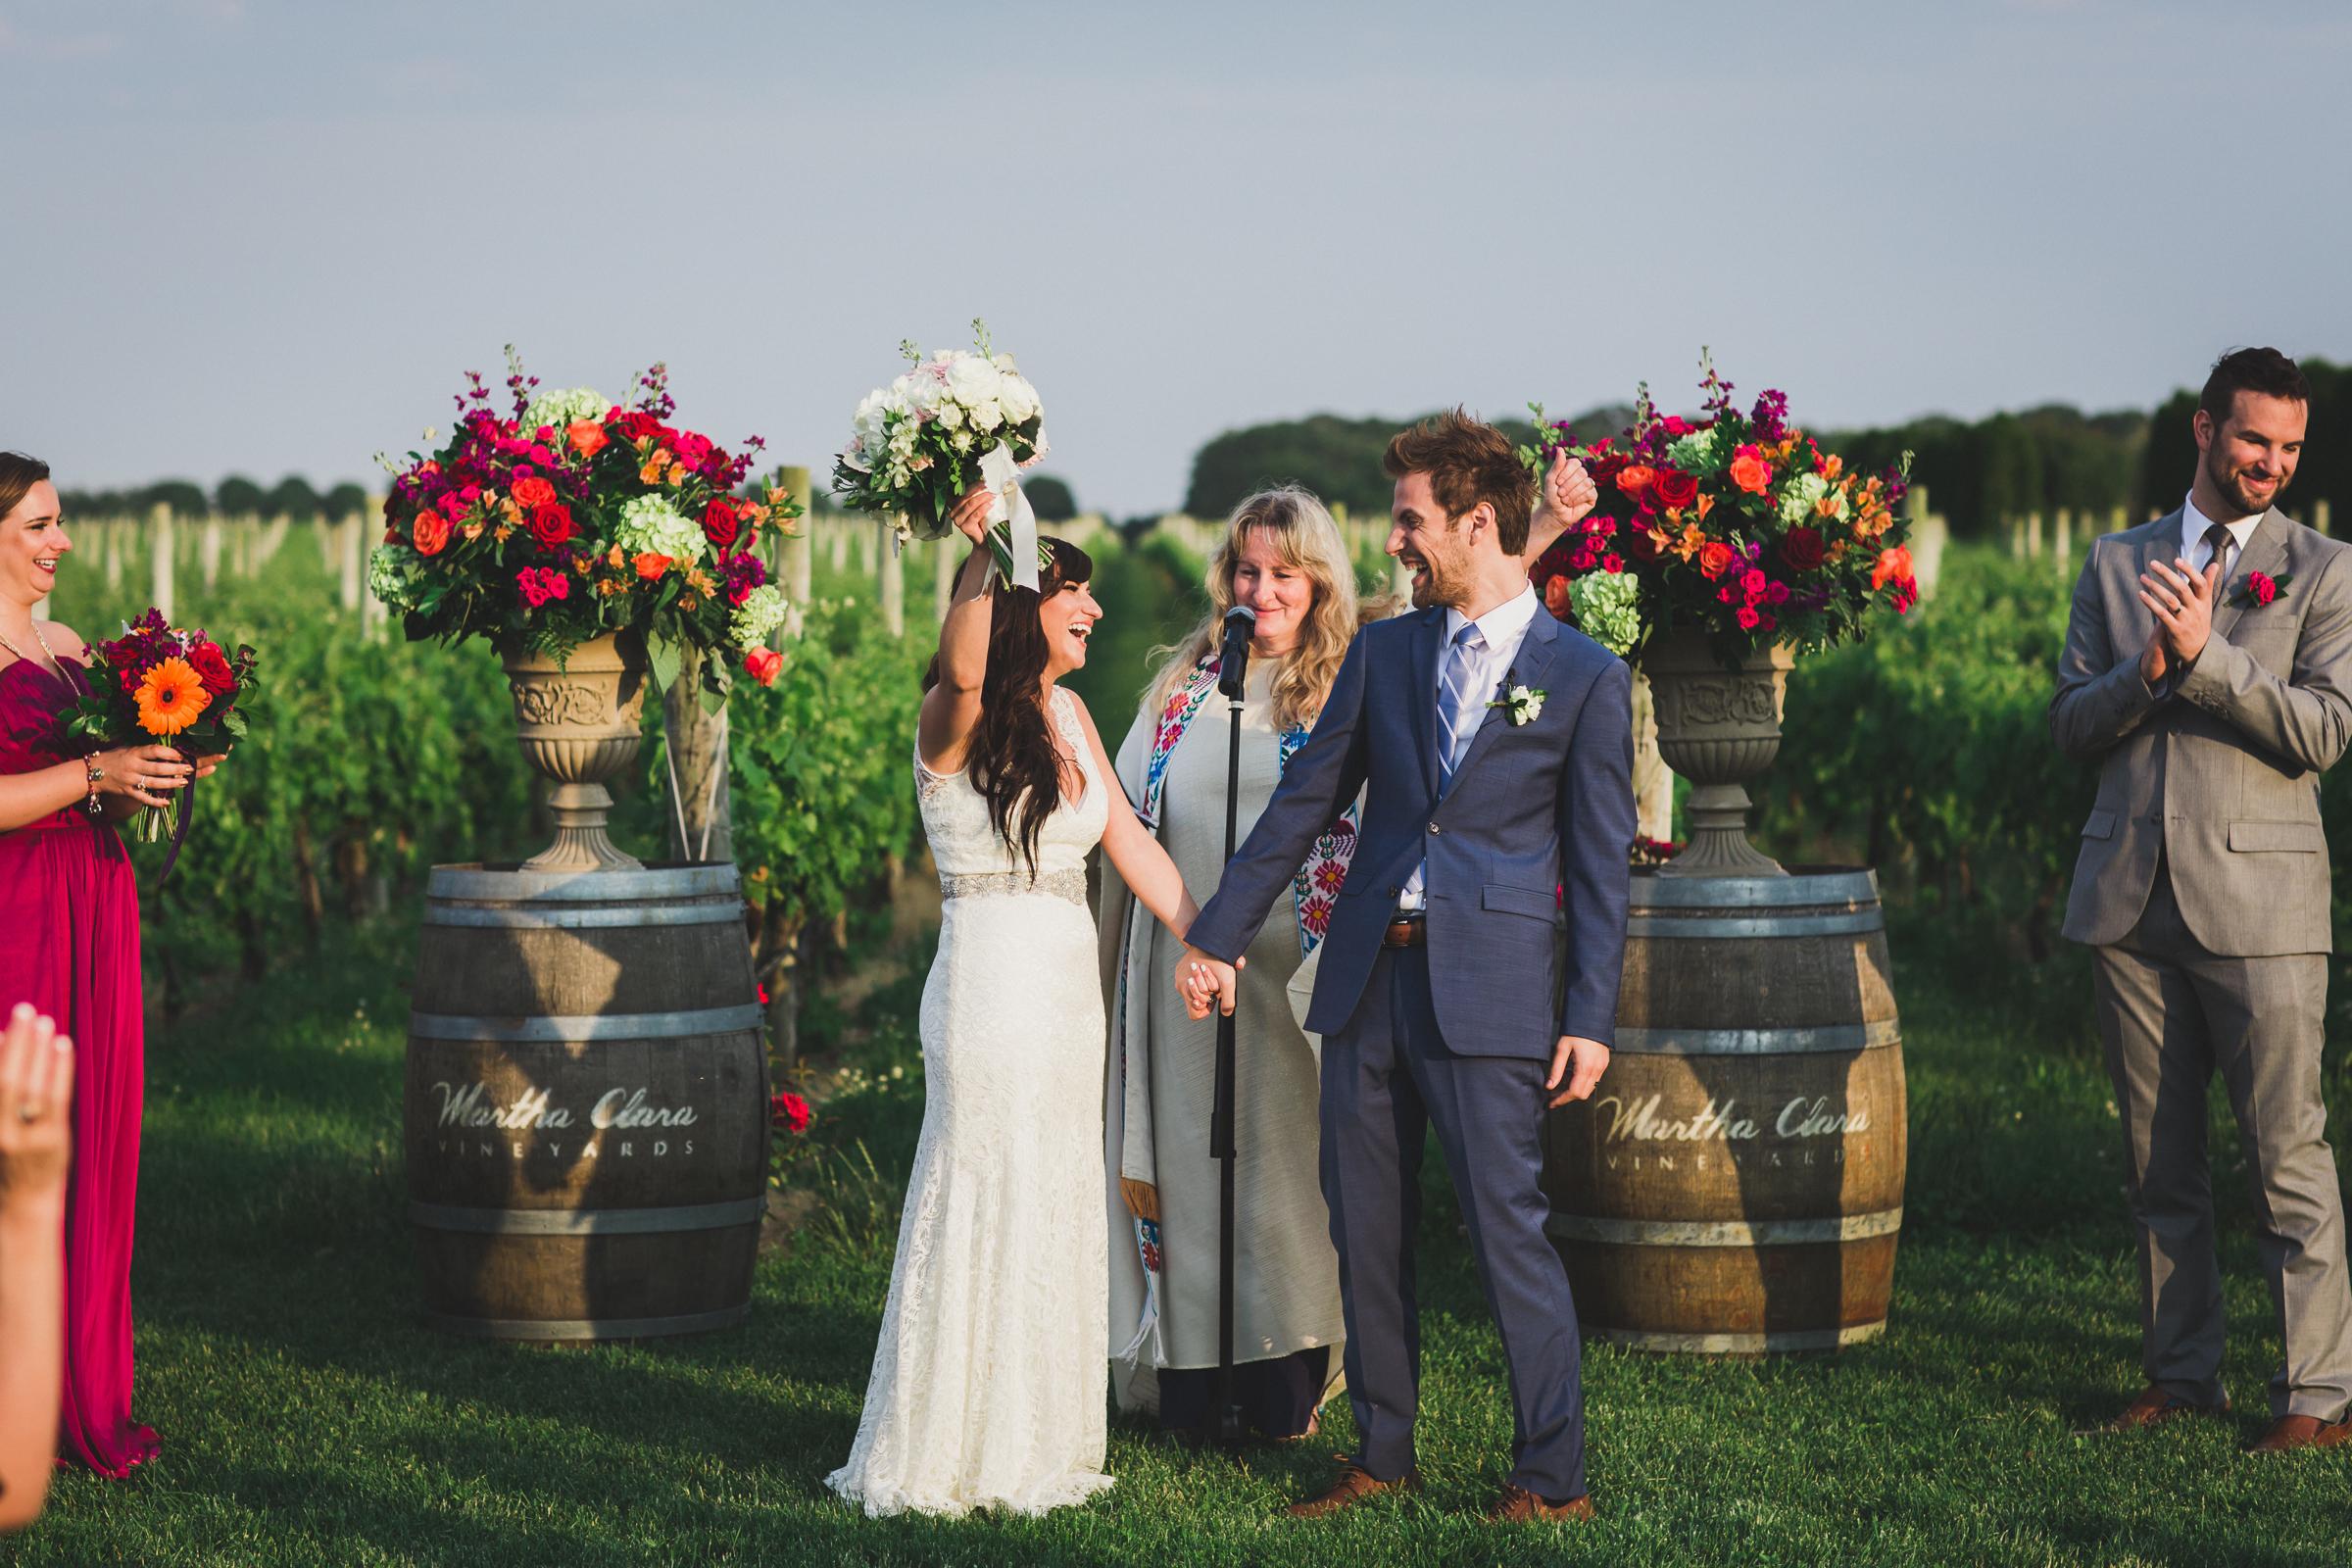 Martha-Clara-Vineyard-Long-Island-Documentary-Wedding-Photographer-58.jpg